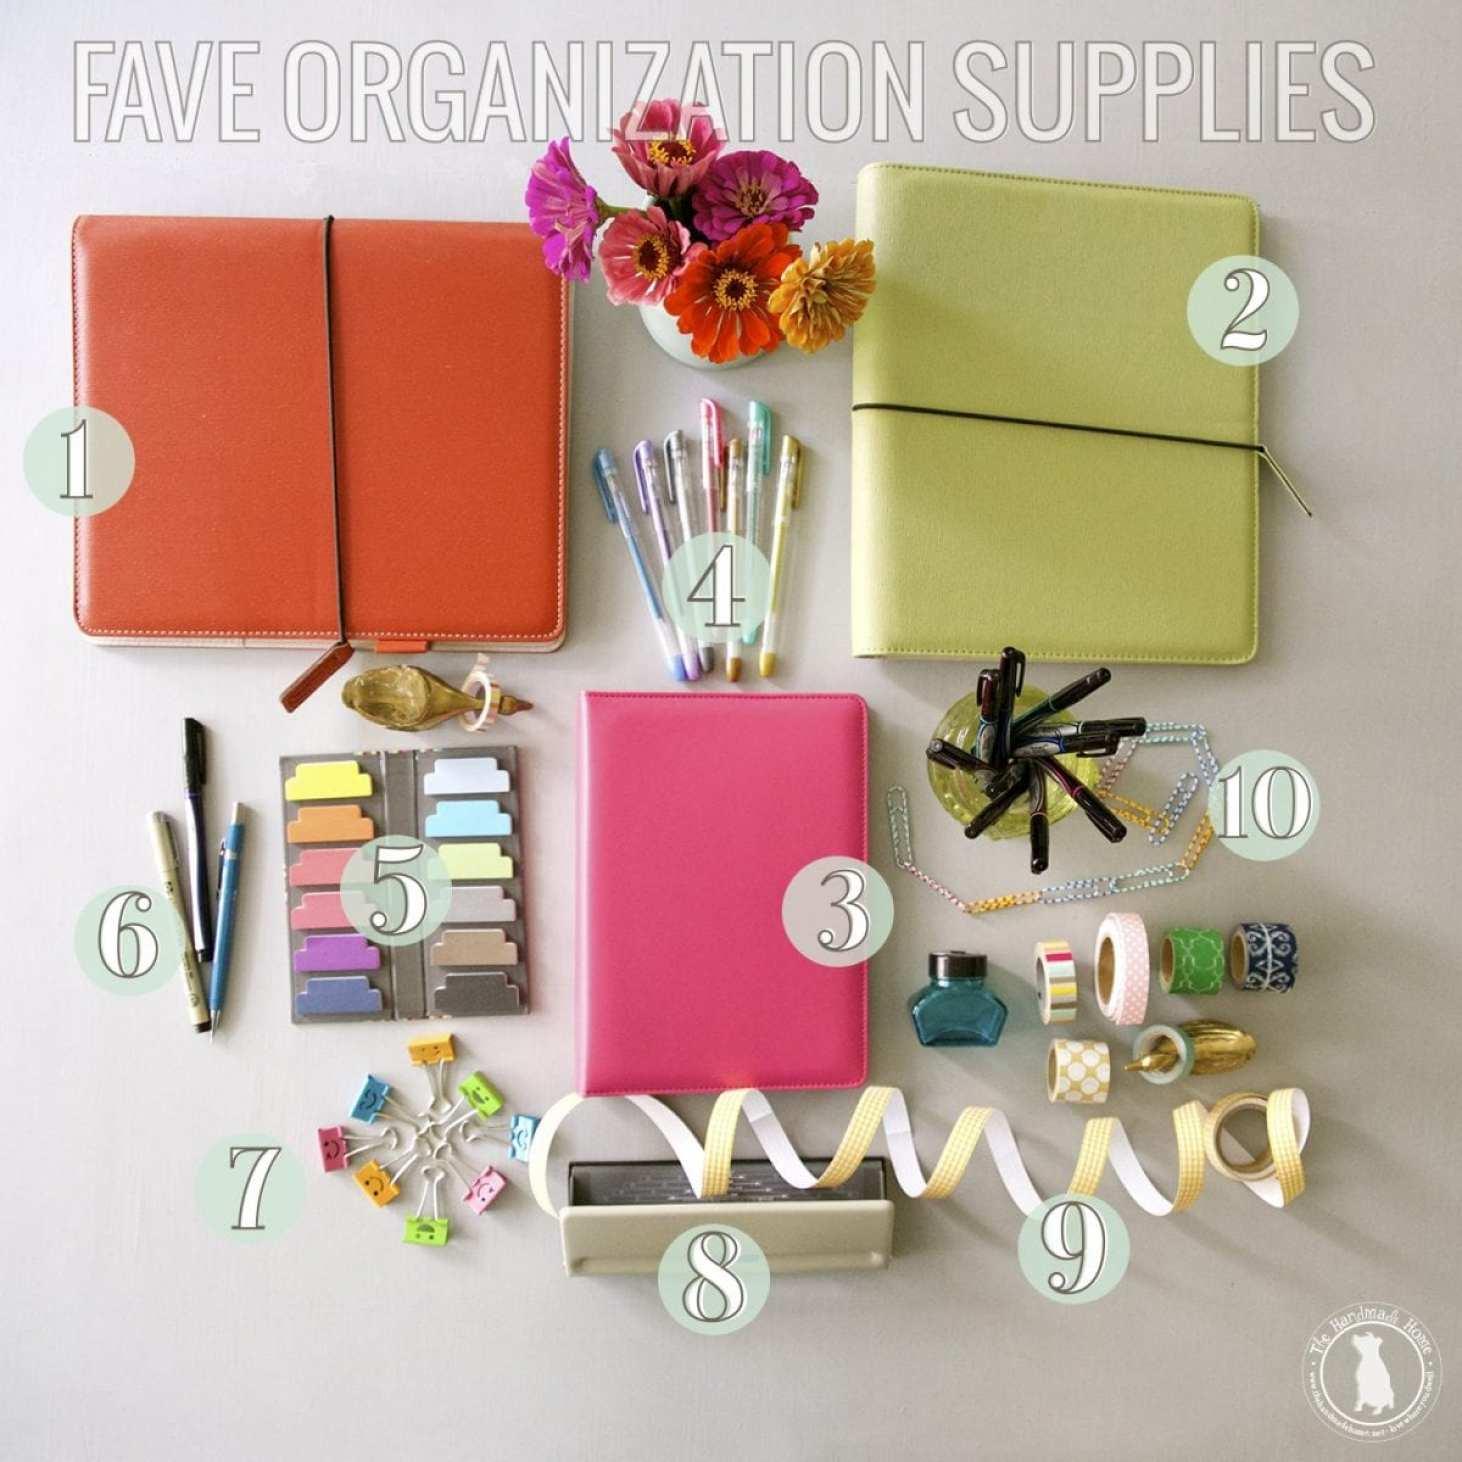 fave_organization_supplies